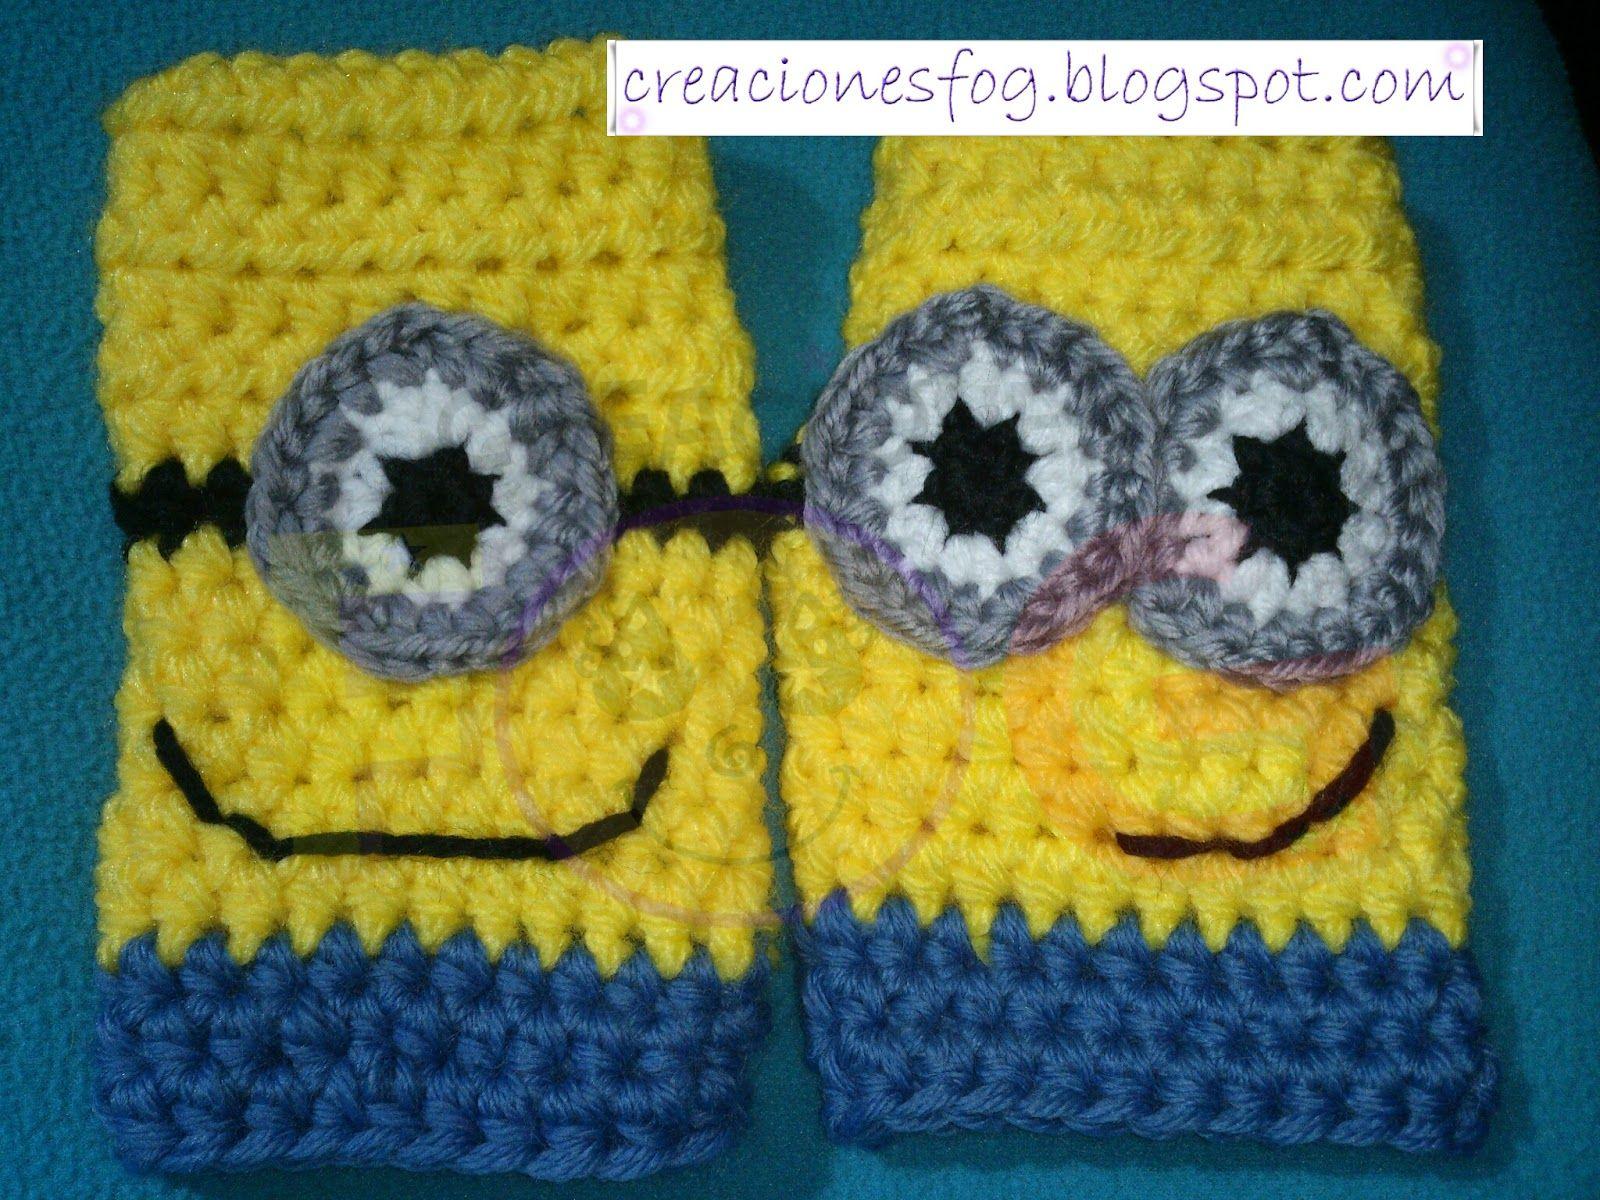 Creaciones fog guantes sin dedo minion mis trabajos a crochet creaciones fog guantes sin dedo minion bankloansurffo Choice Image